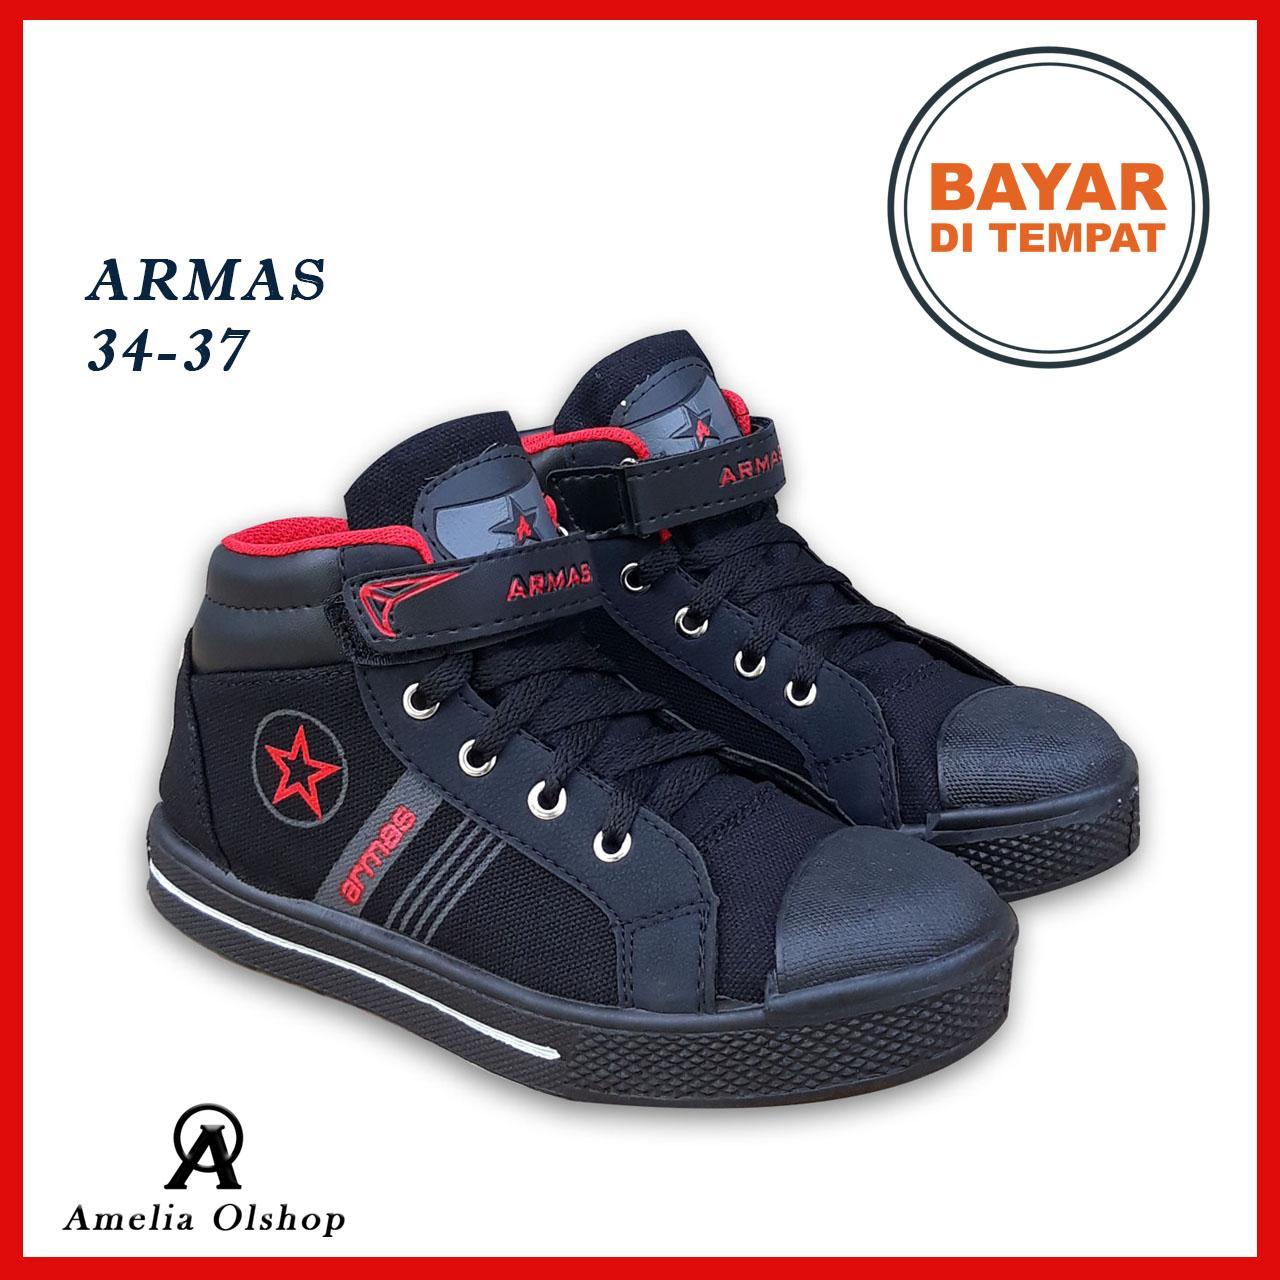 Amelia Olshop - Sepatu Sekolah Anak ARMAS 34-37   Sepatu Sekolah Anak SD   04b4da03b7